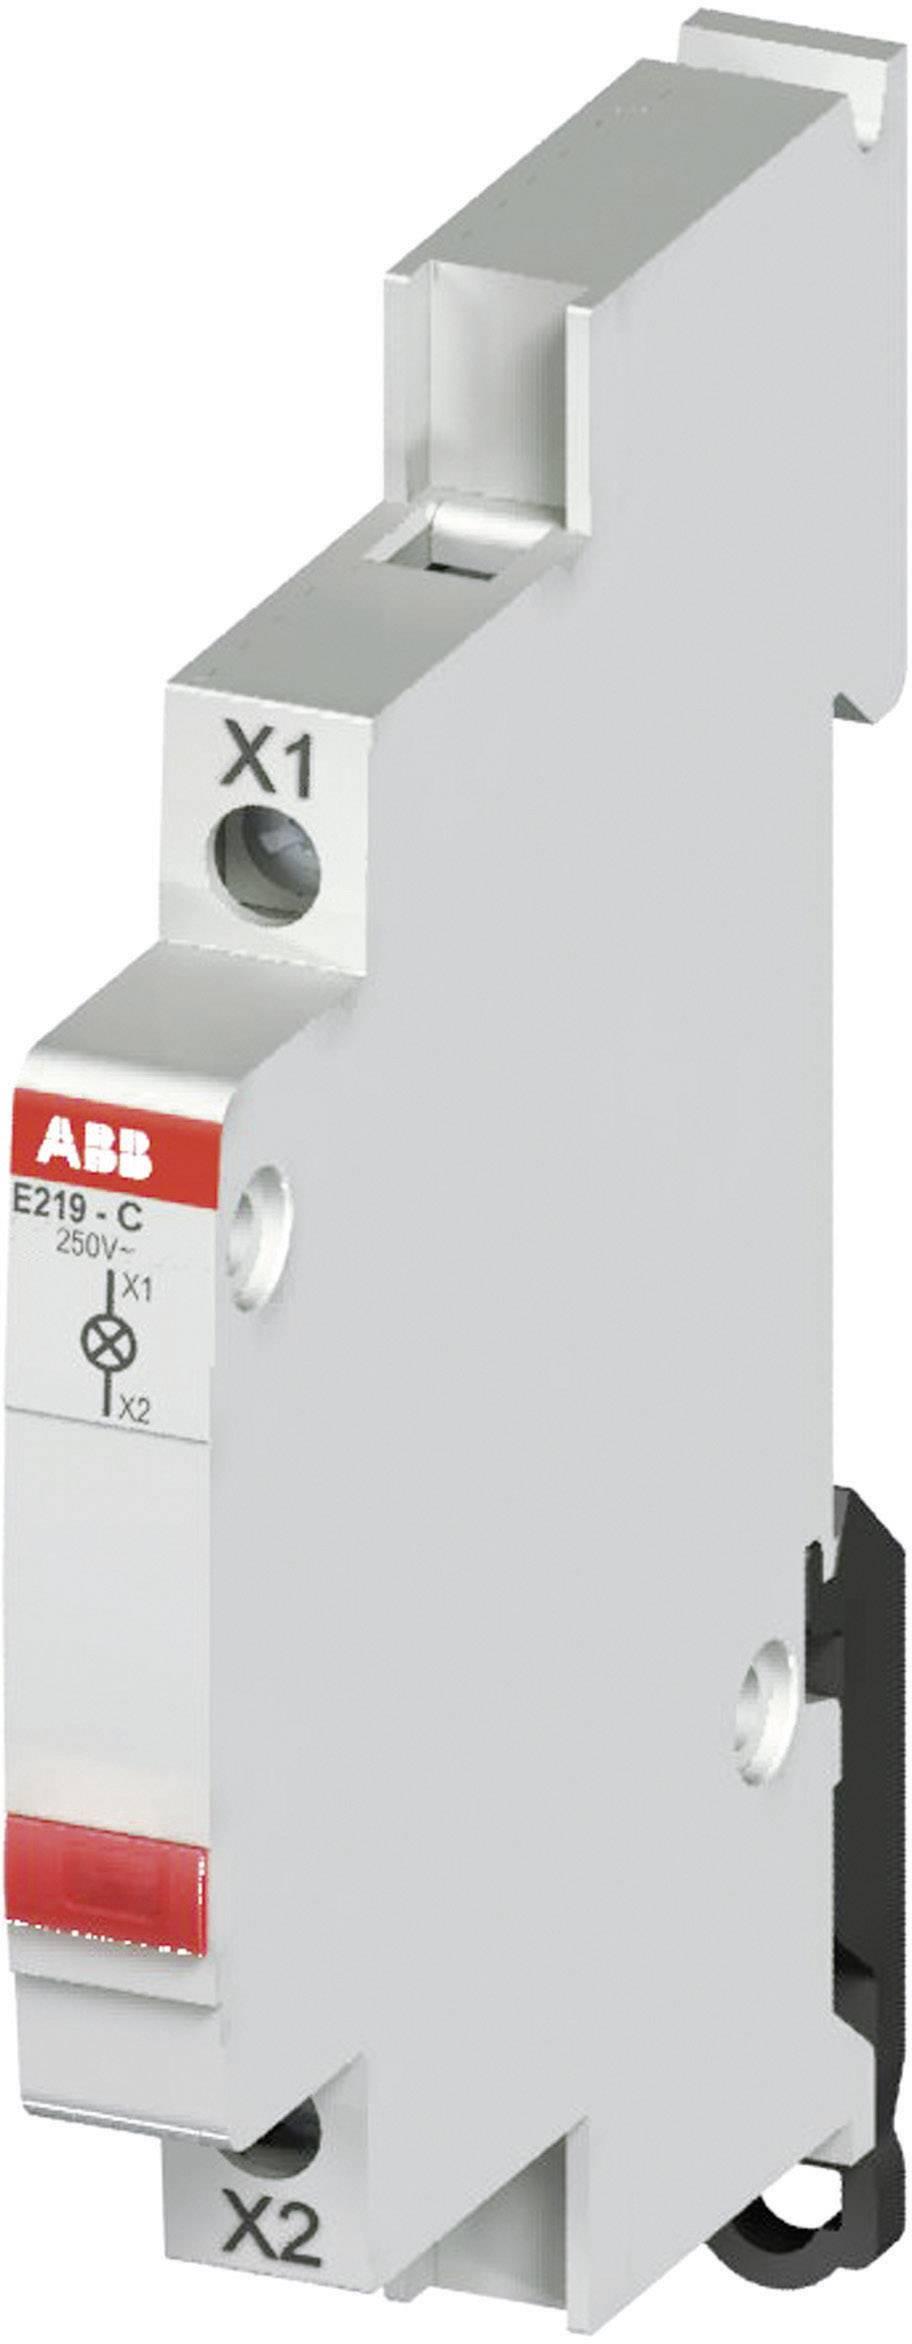 Kontrolka ABB na DIN lištu, 115/250 V, červená LED, 2CCA703401R0001